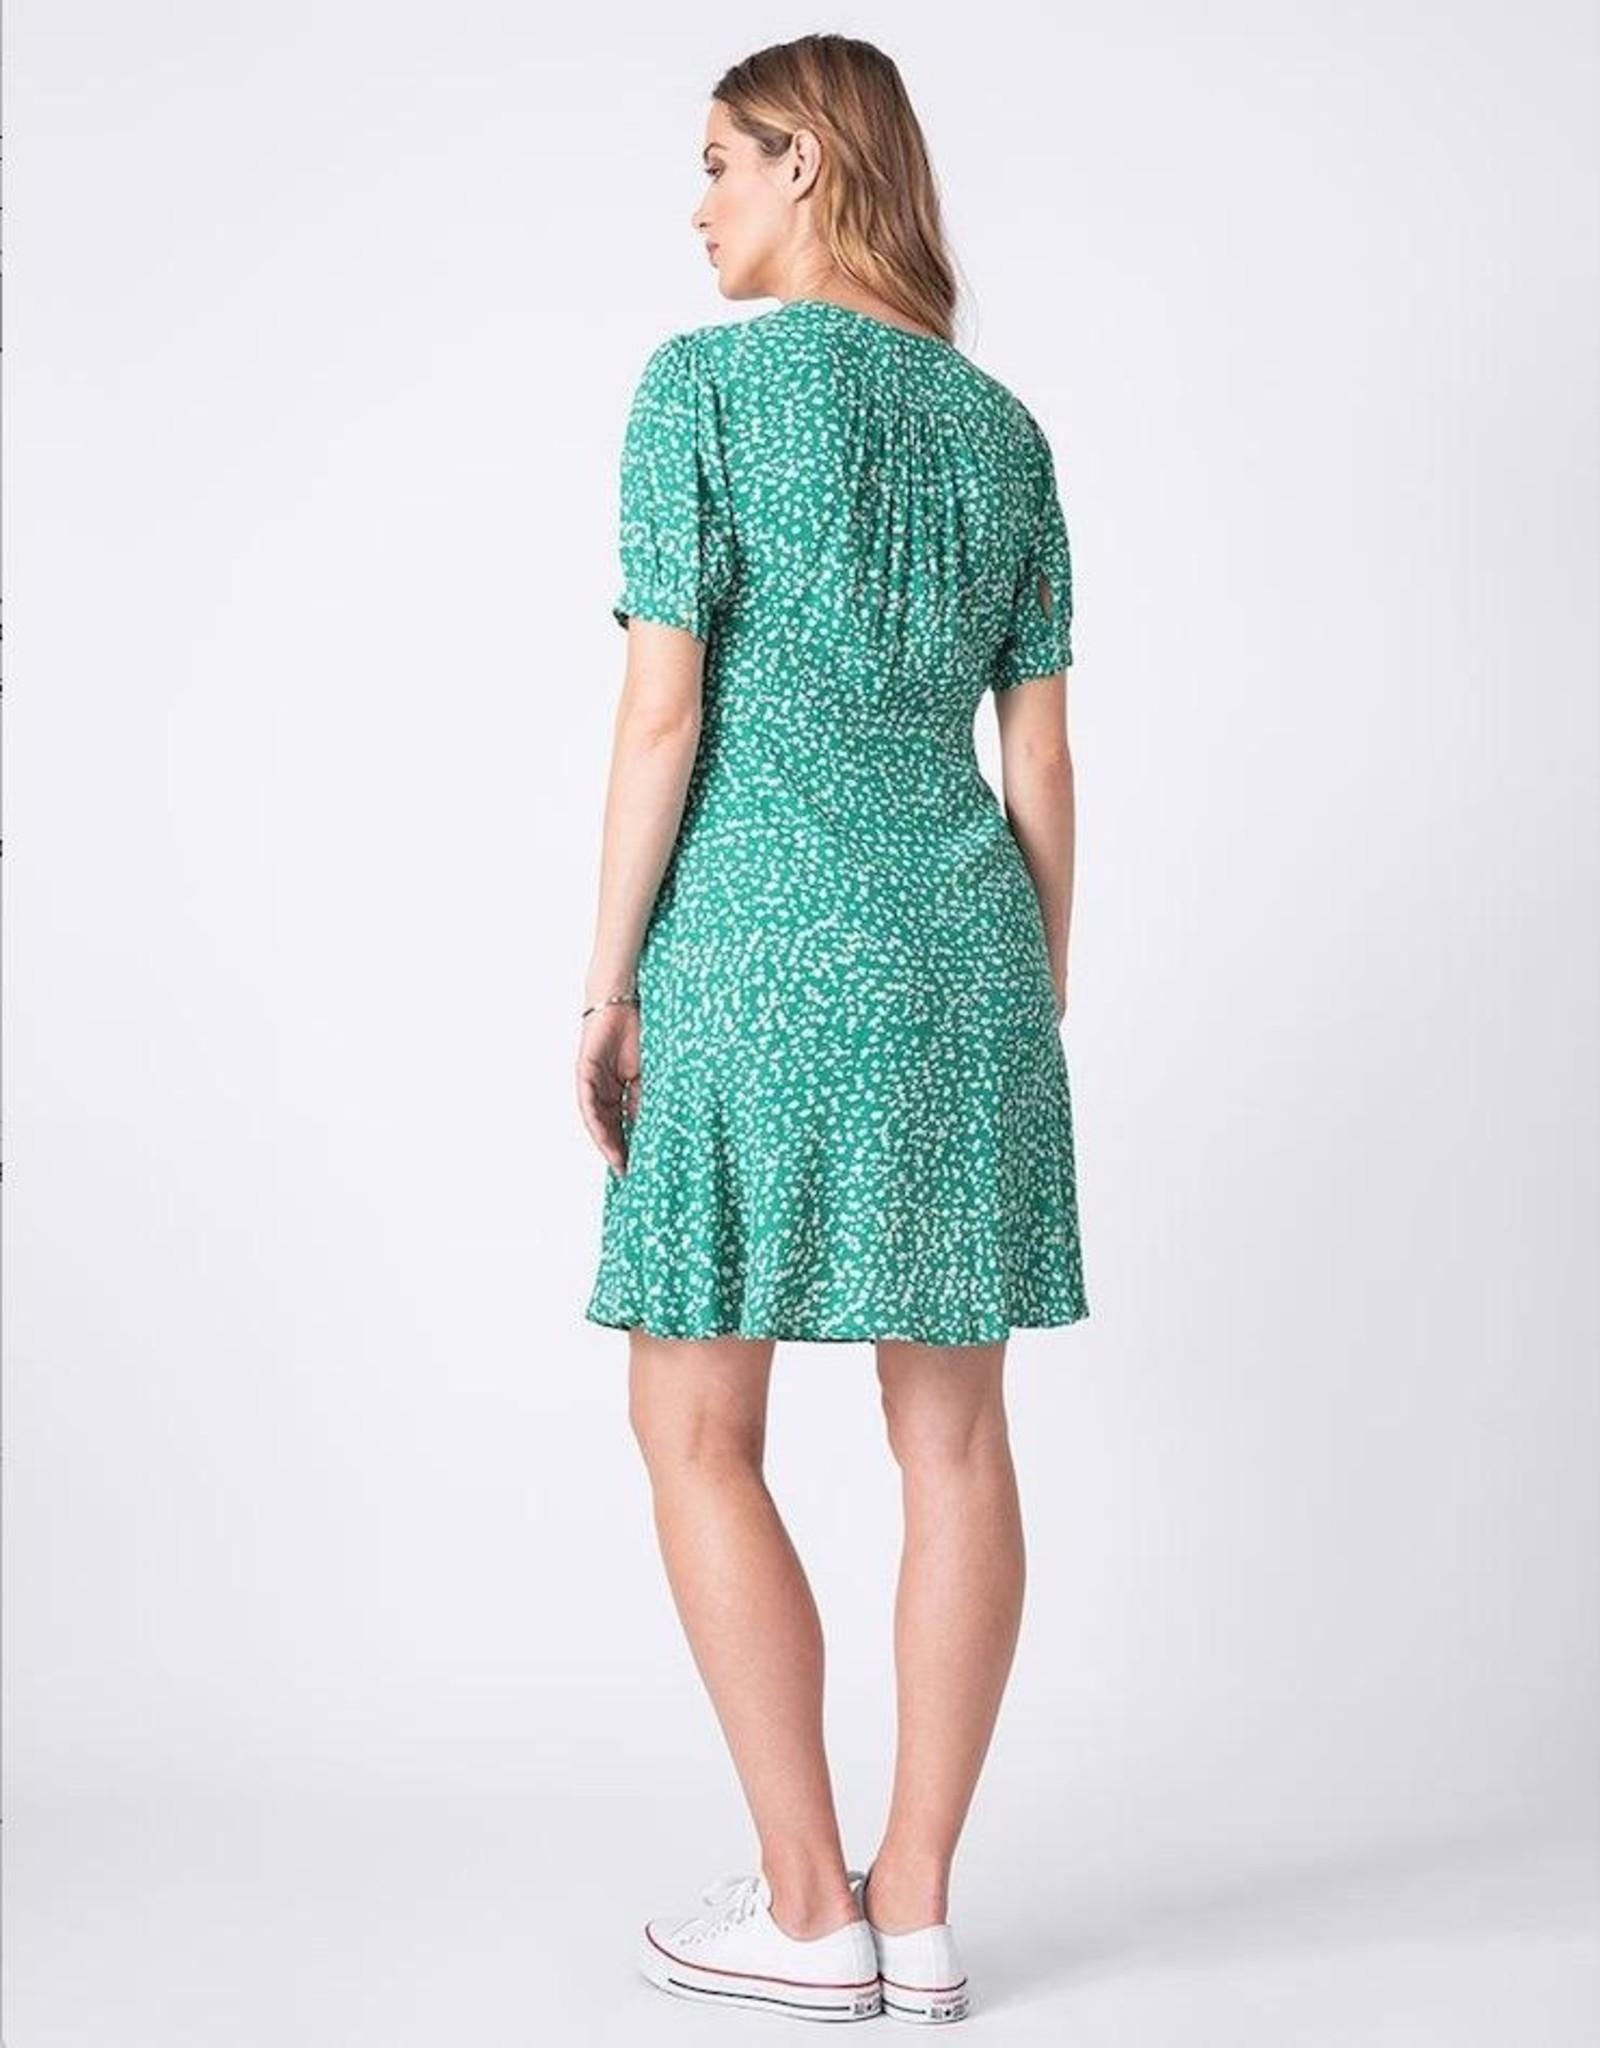 Seraphine Daffodil Green Printed Maternity Dress